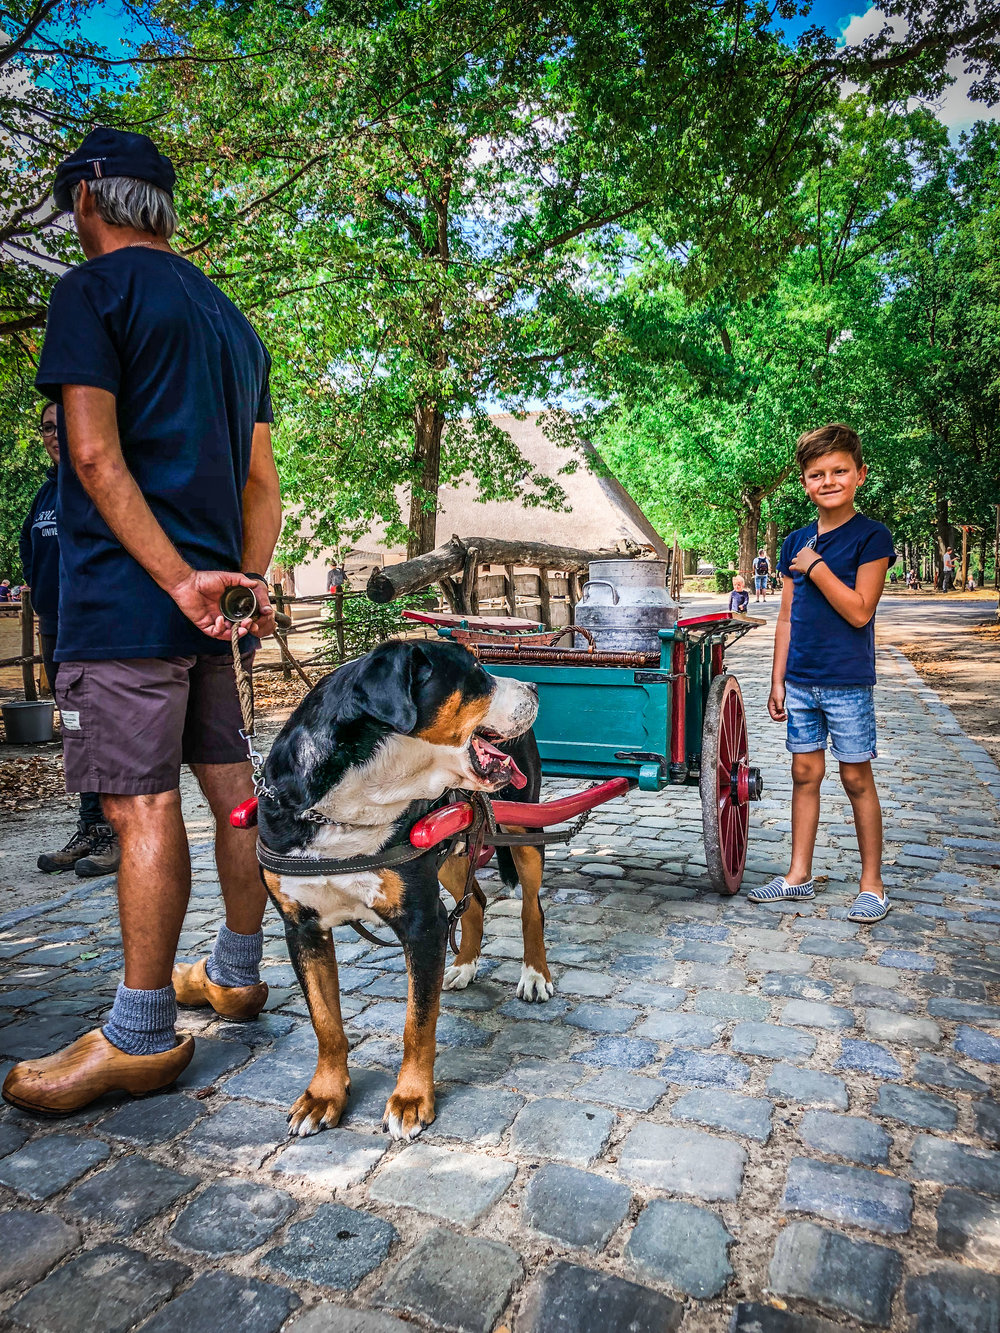 Bokrijk - Hondenkar